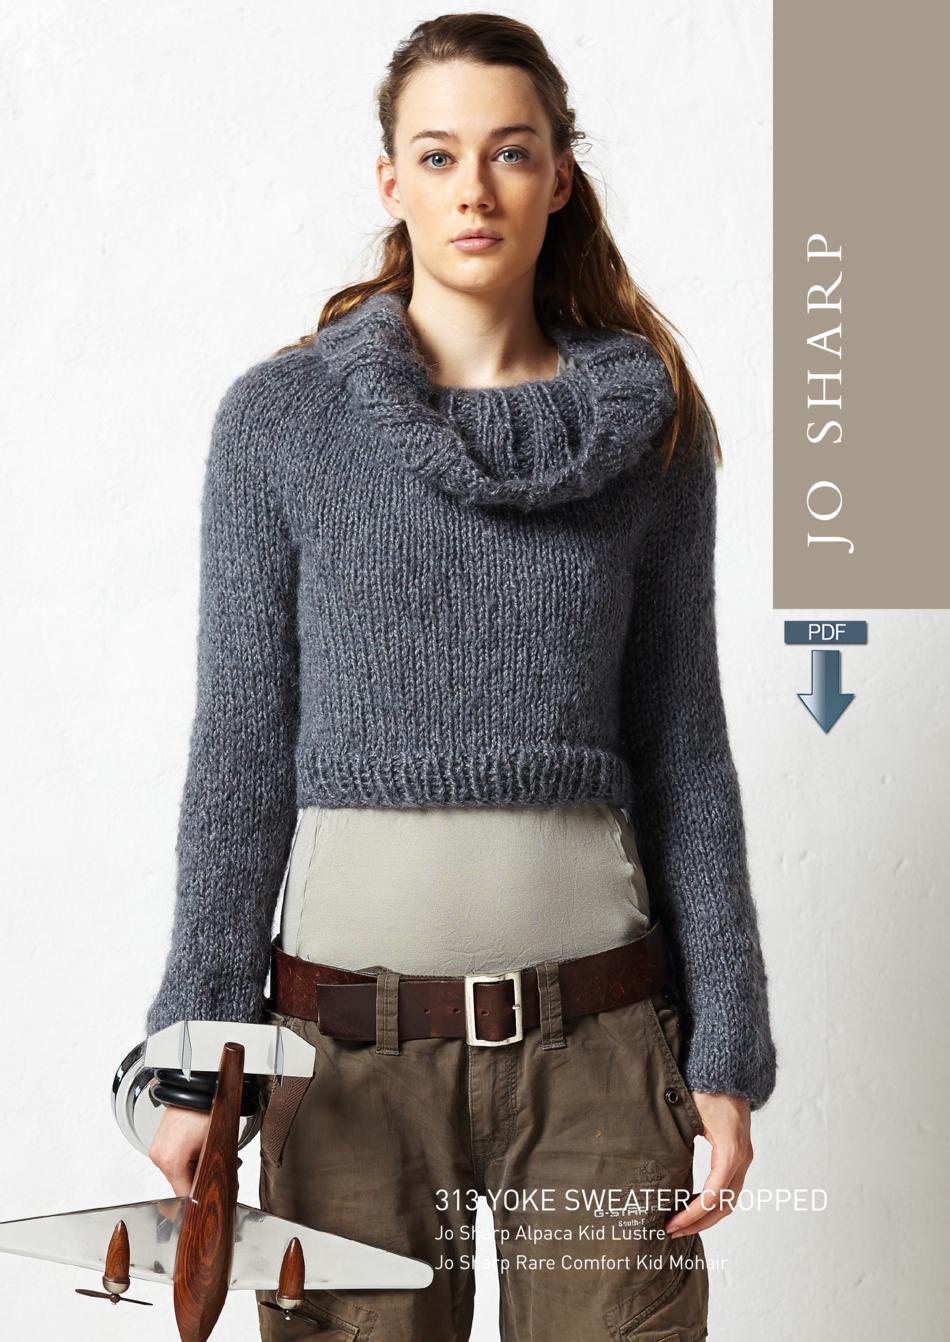 Jo Sharp Cropped Yoke Cowl Sweater Pattern Download Knitting